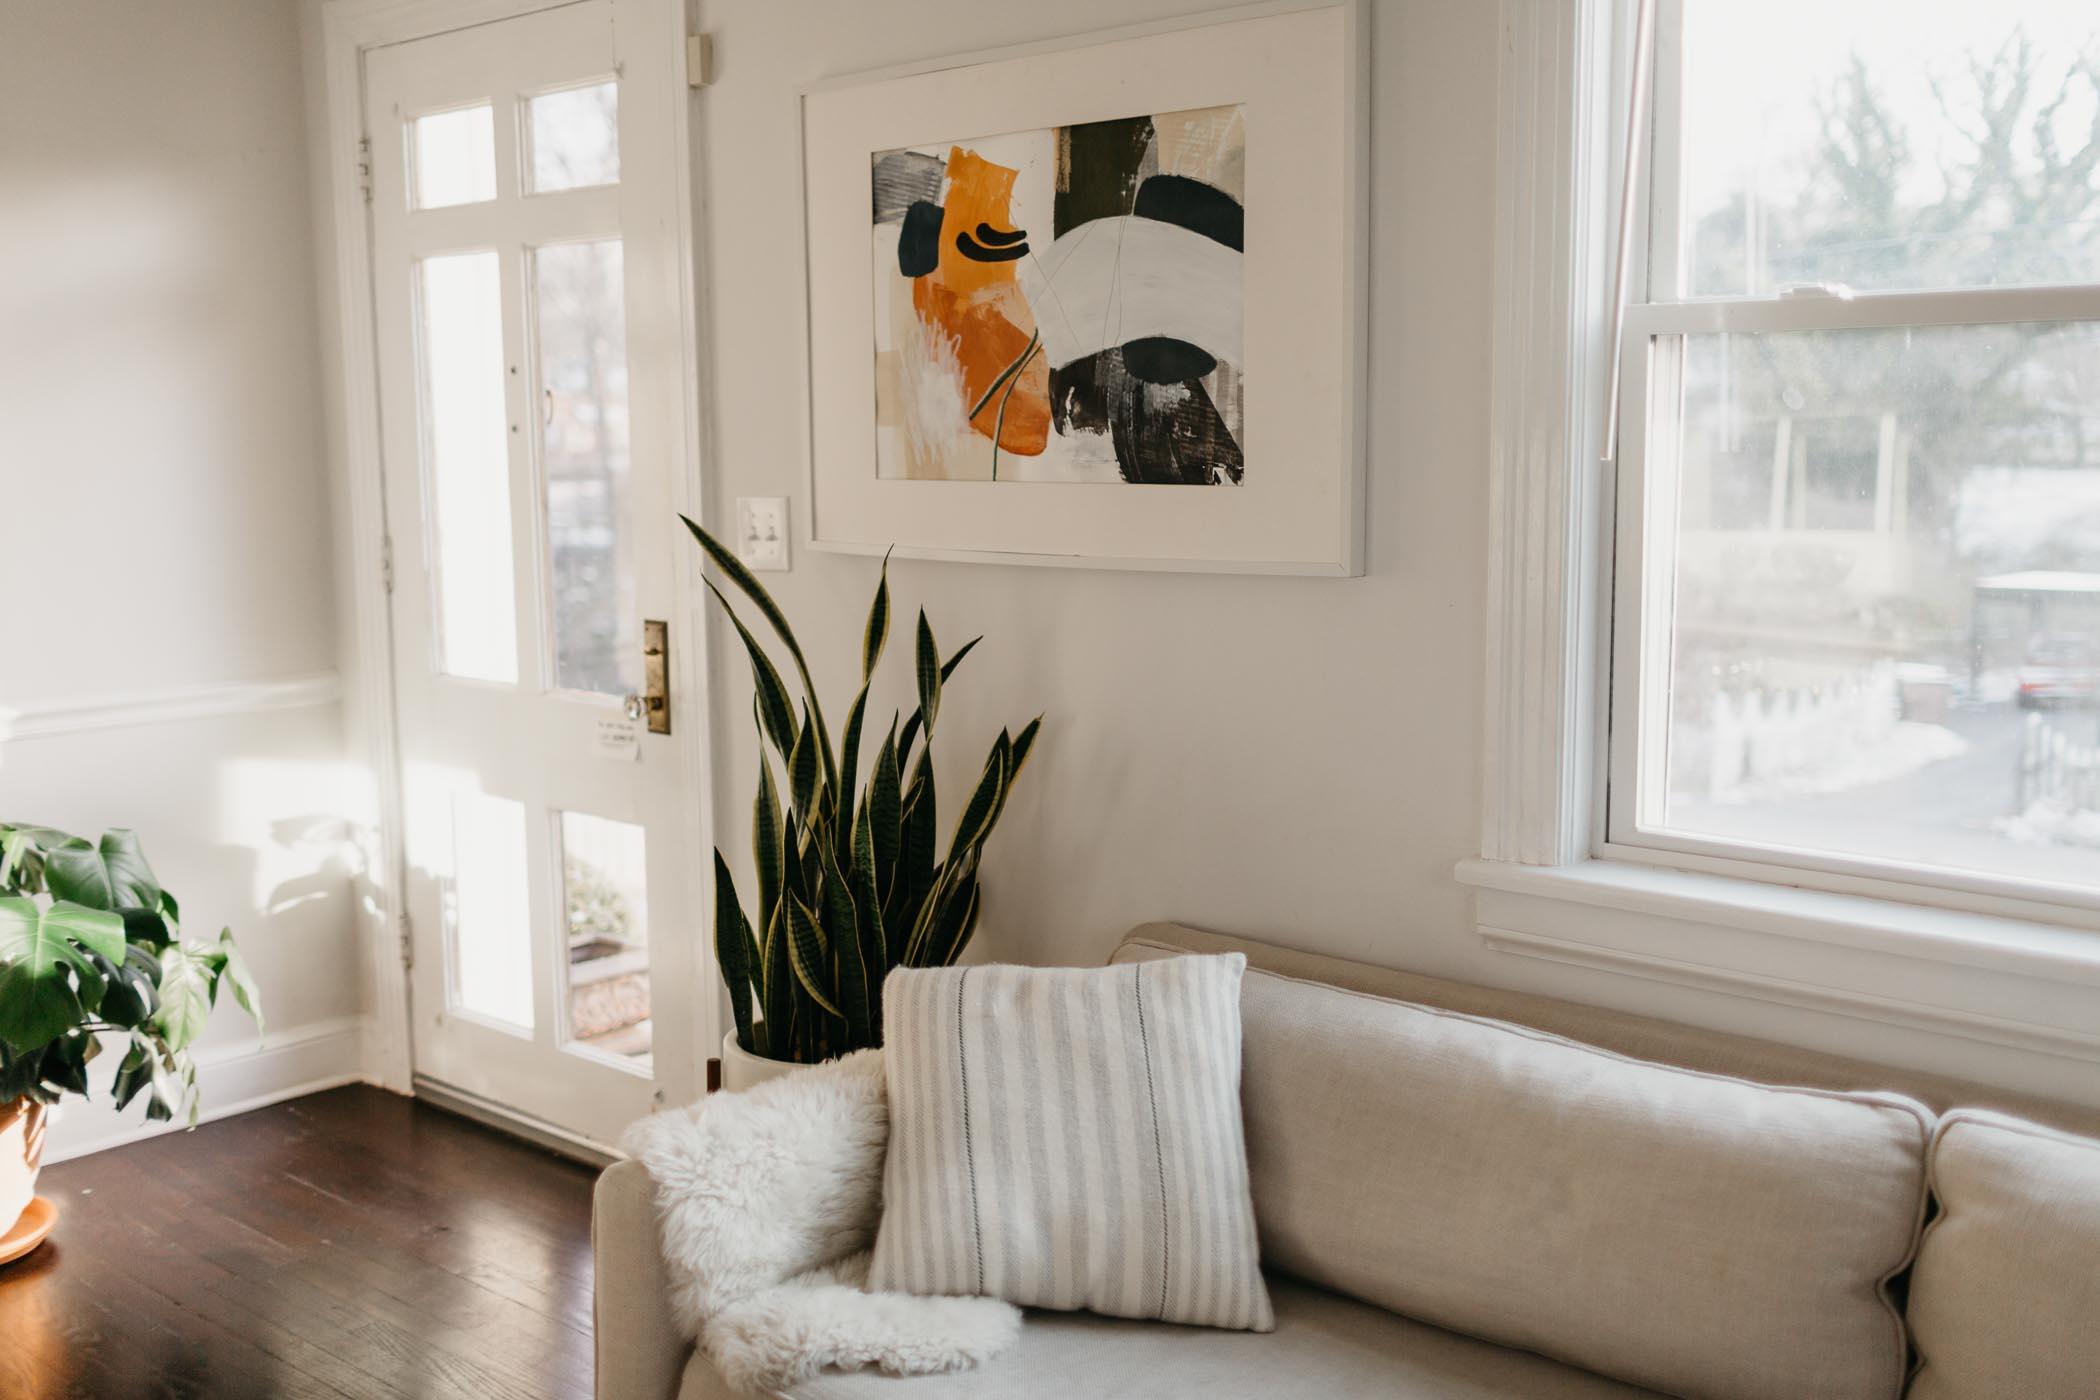 cozy-casa-nashville-tn-natural-light-studio-photography-ideas-lifestyle-photographer-photography-27.jpg